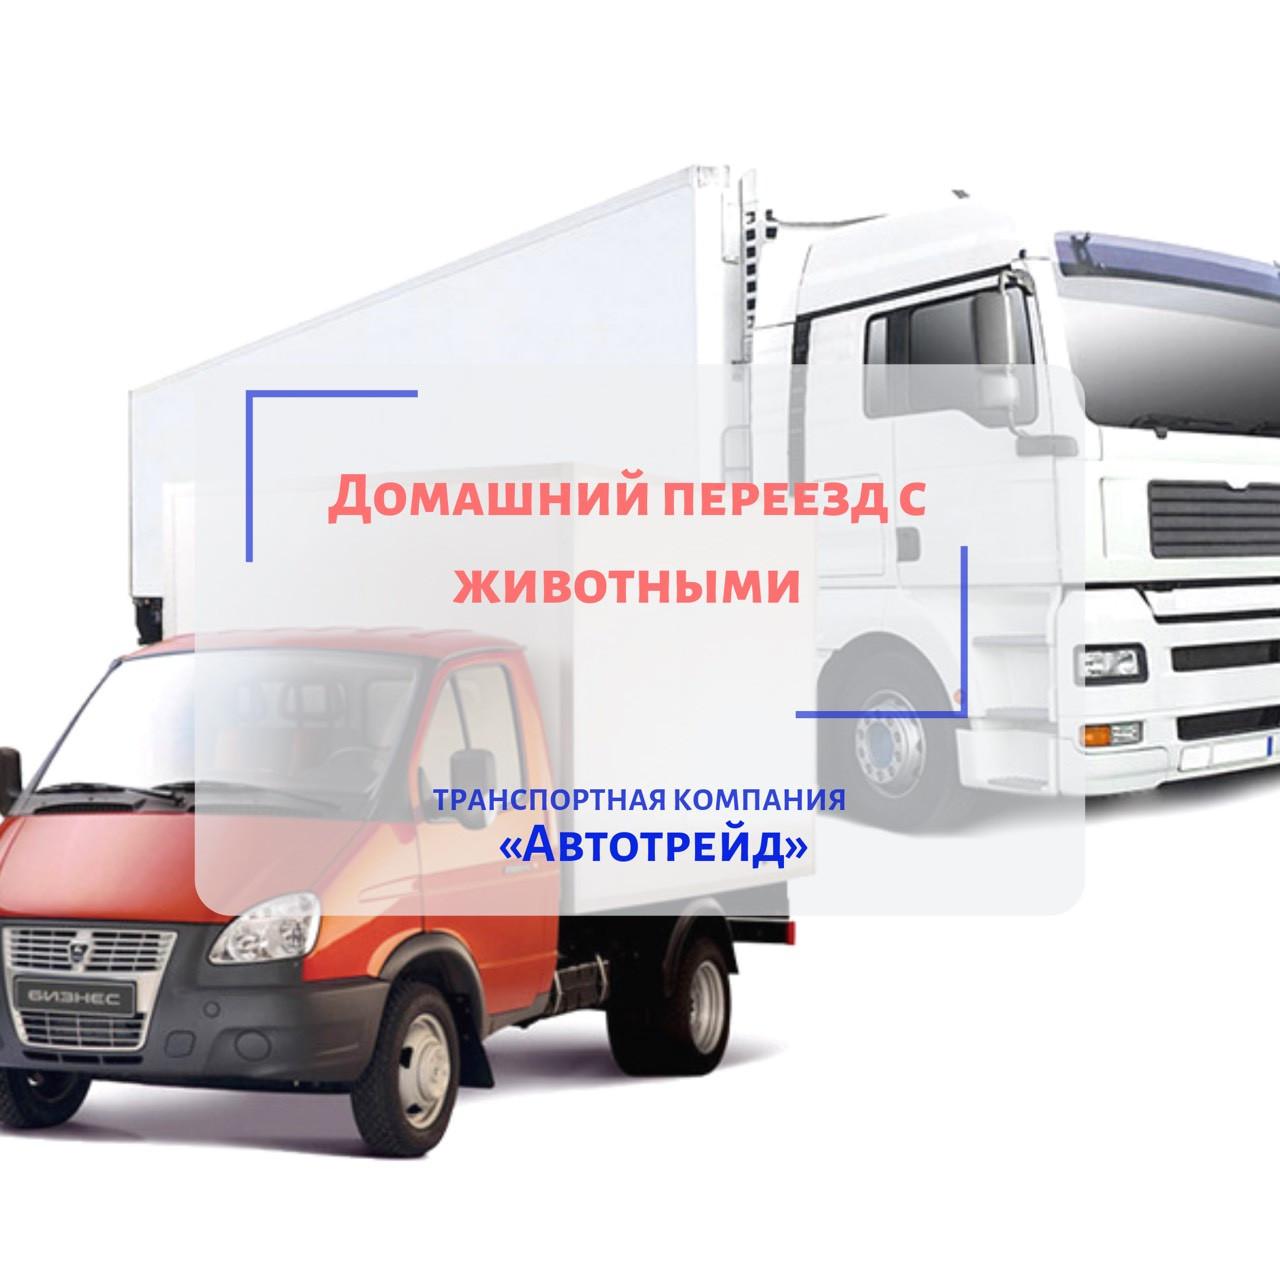 Домашний переезд с животными по Украине. Заявка